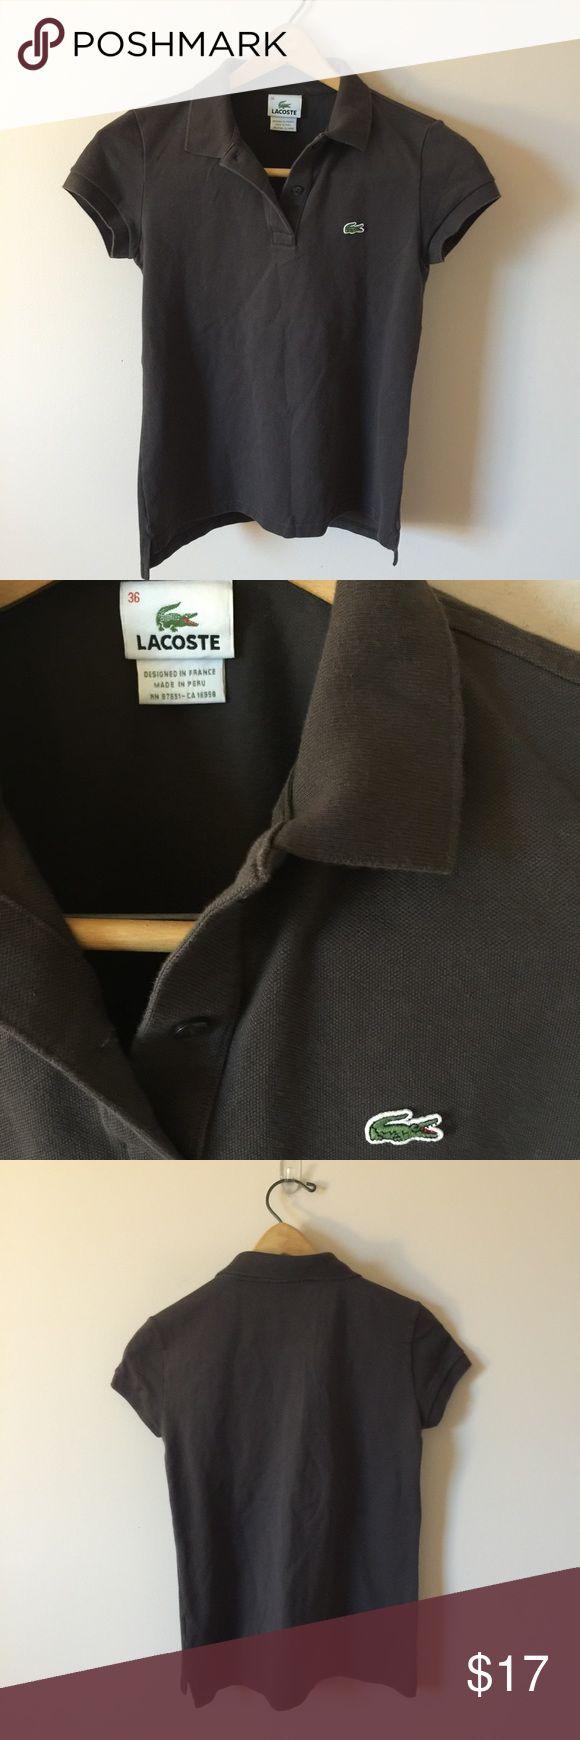 Lacoste Polo Shirt Brown Lacoste Polo Shirt. Size 36. 100% cotton. EUC! Lacoste Tops